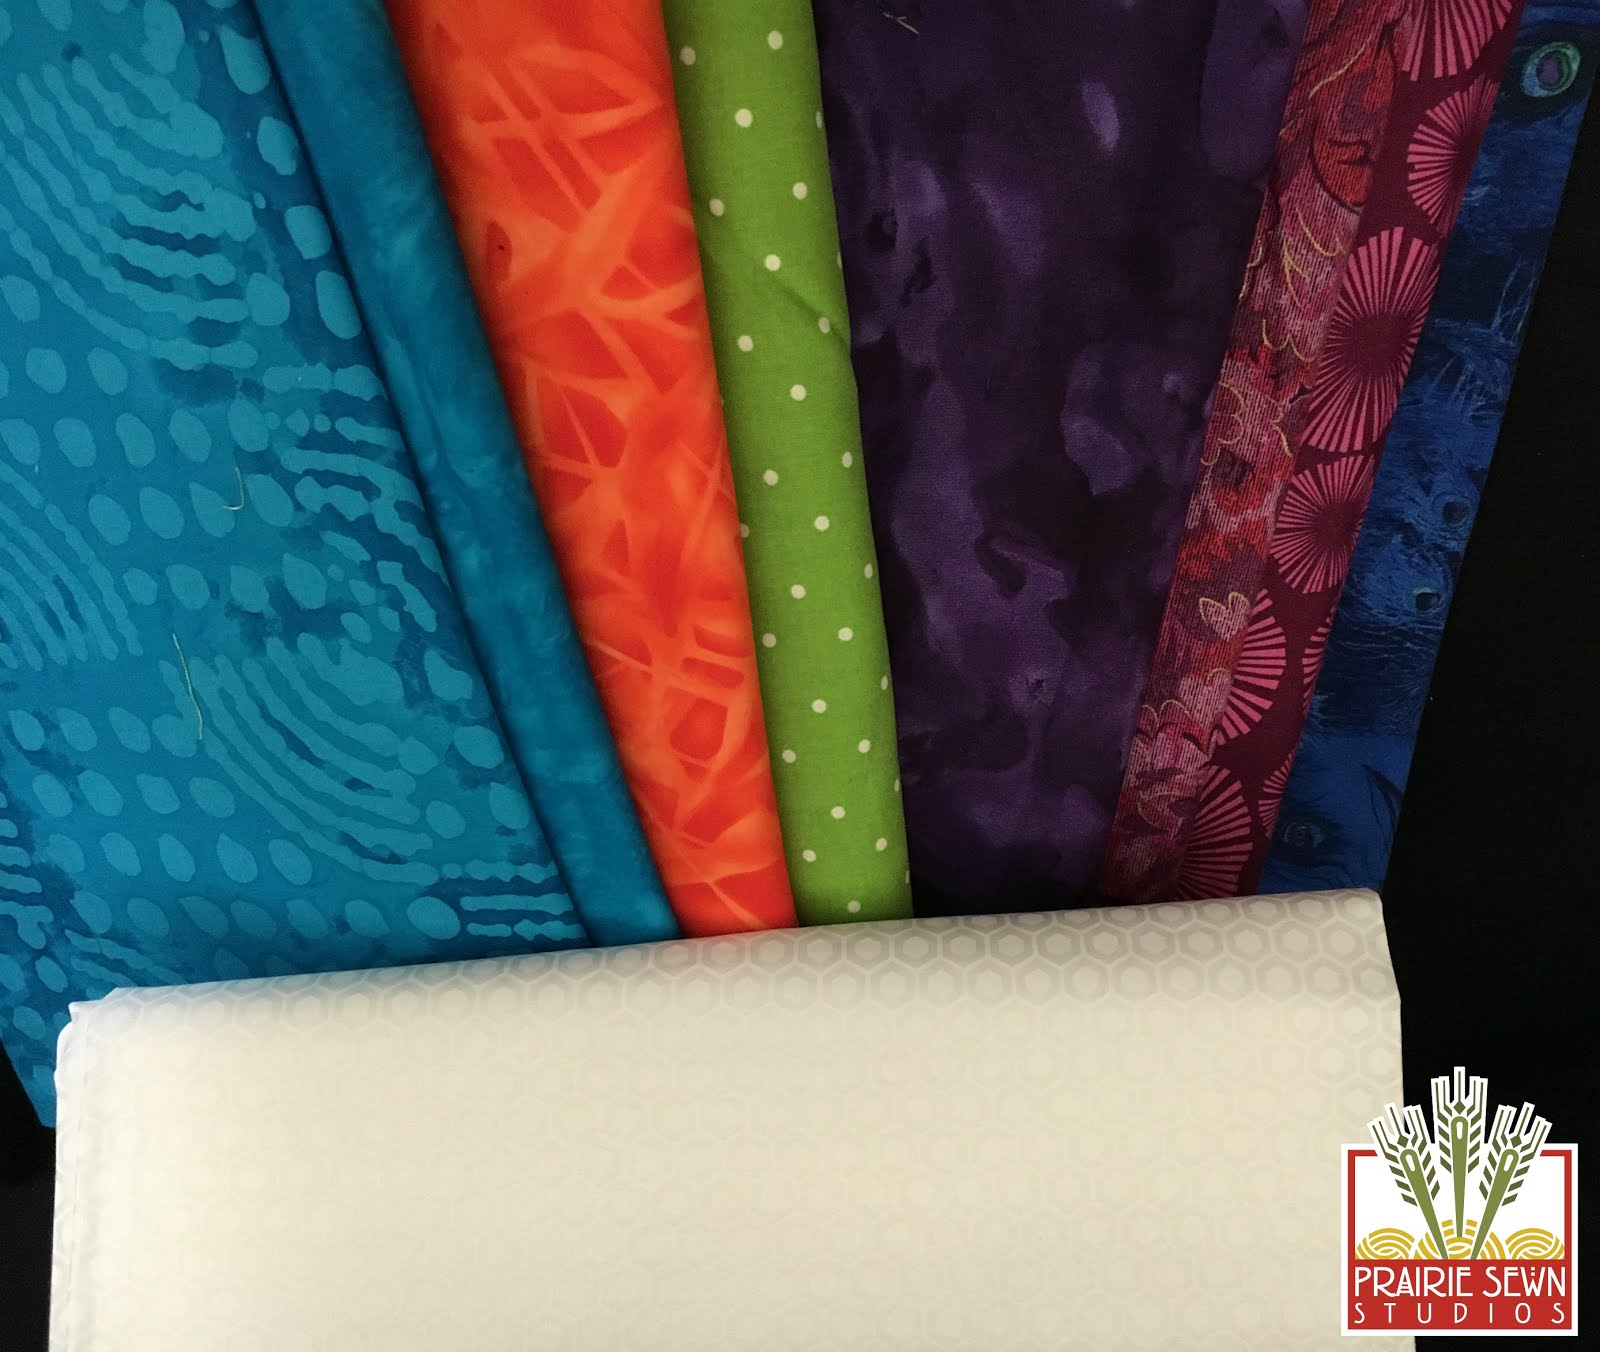 Phoenix Row by Row Fabric